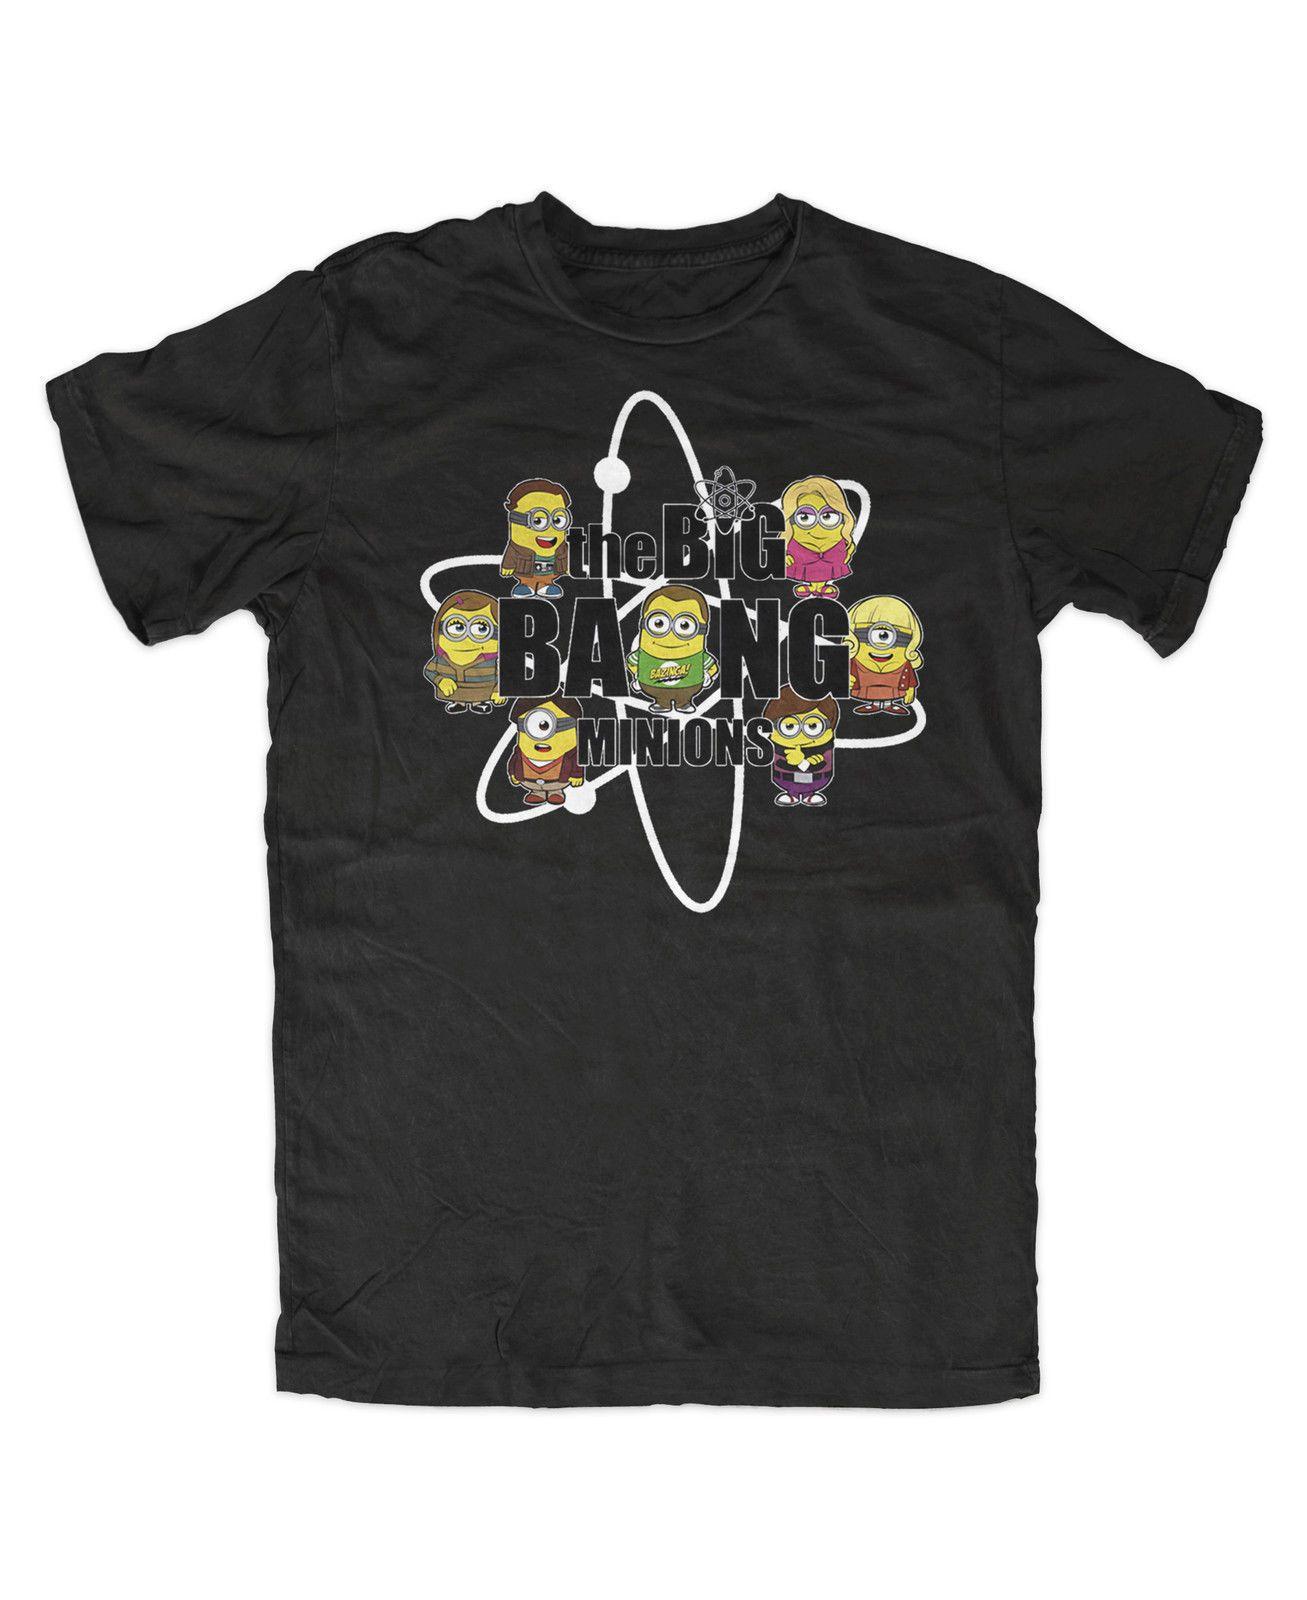 Big Bang Minion T-Shirt sheldon bazinga minions howard cooper in Kleidung & Accessoires, Herrenmode, T-Shirts   eBay